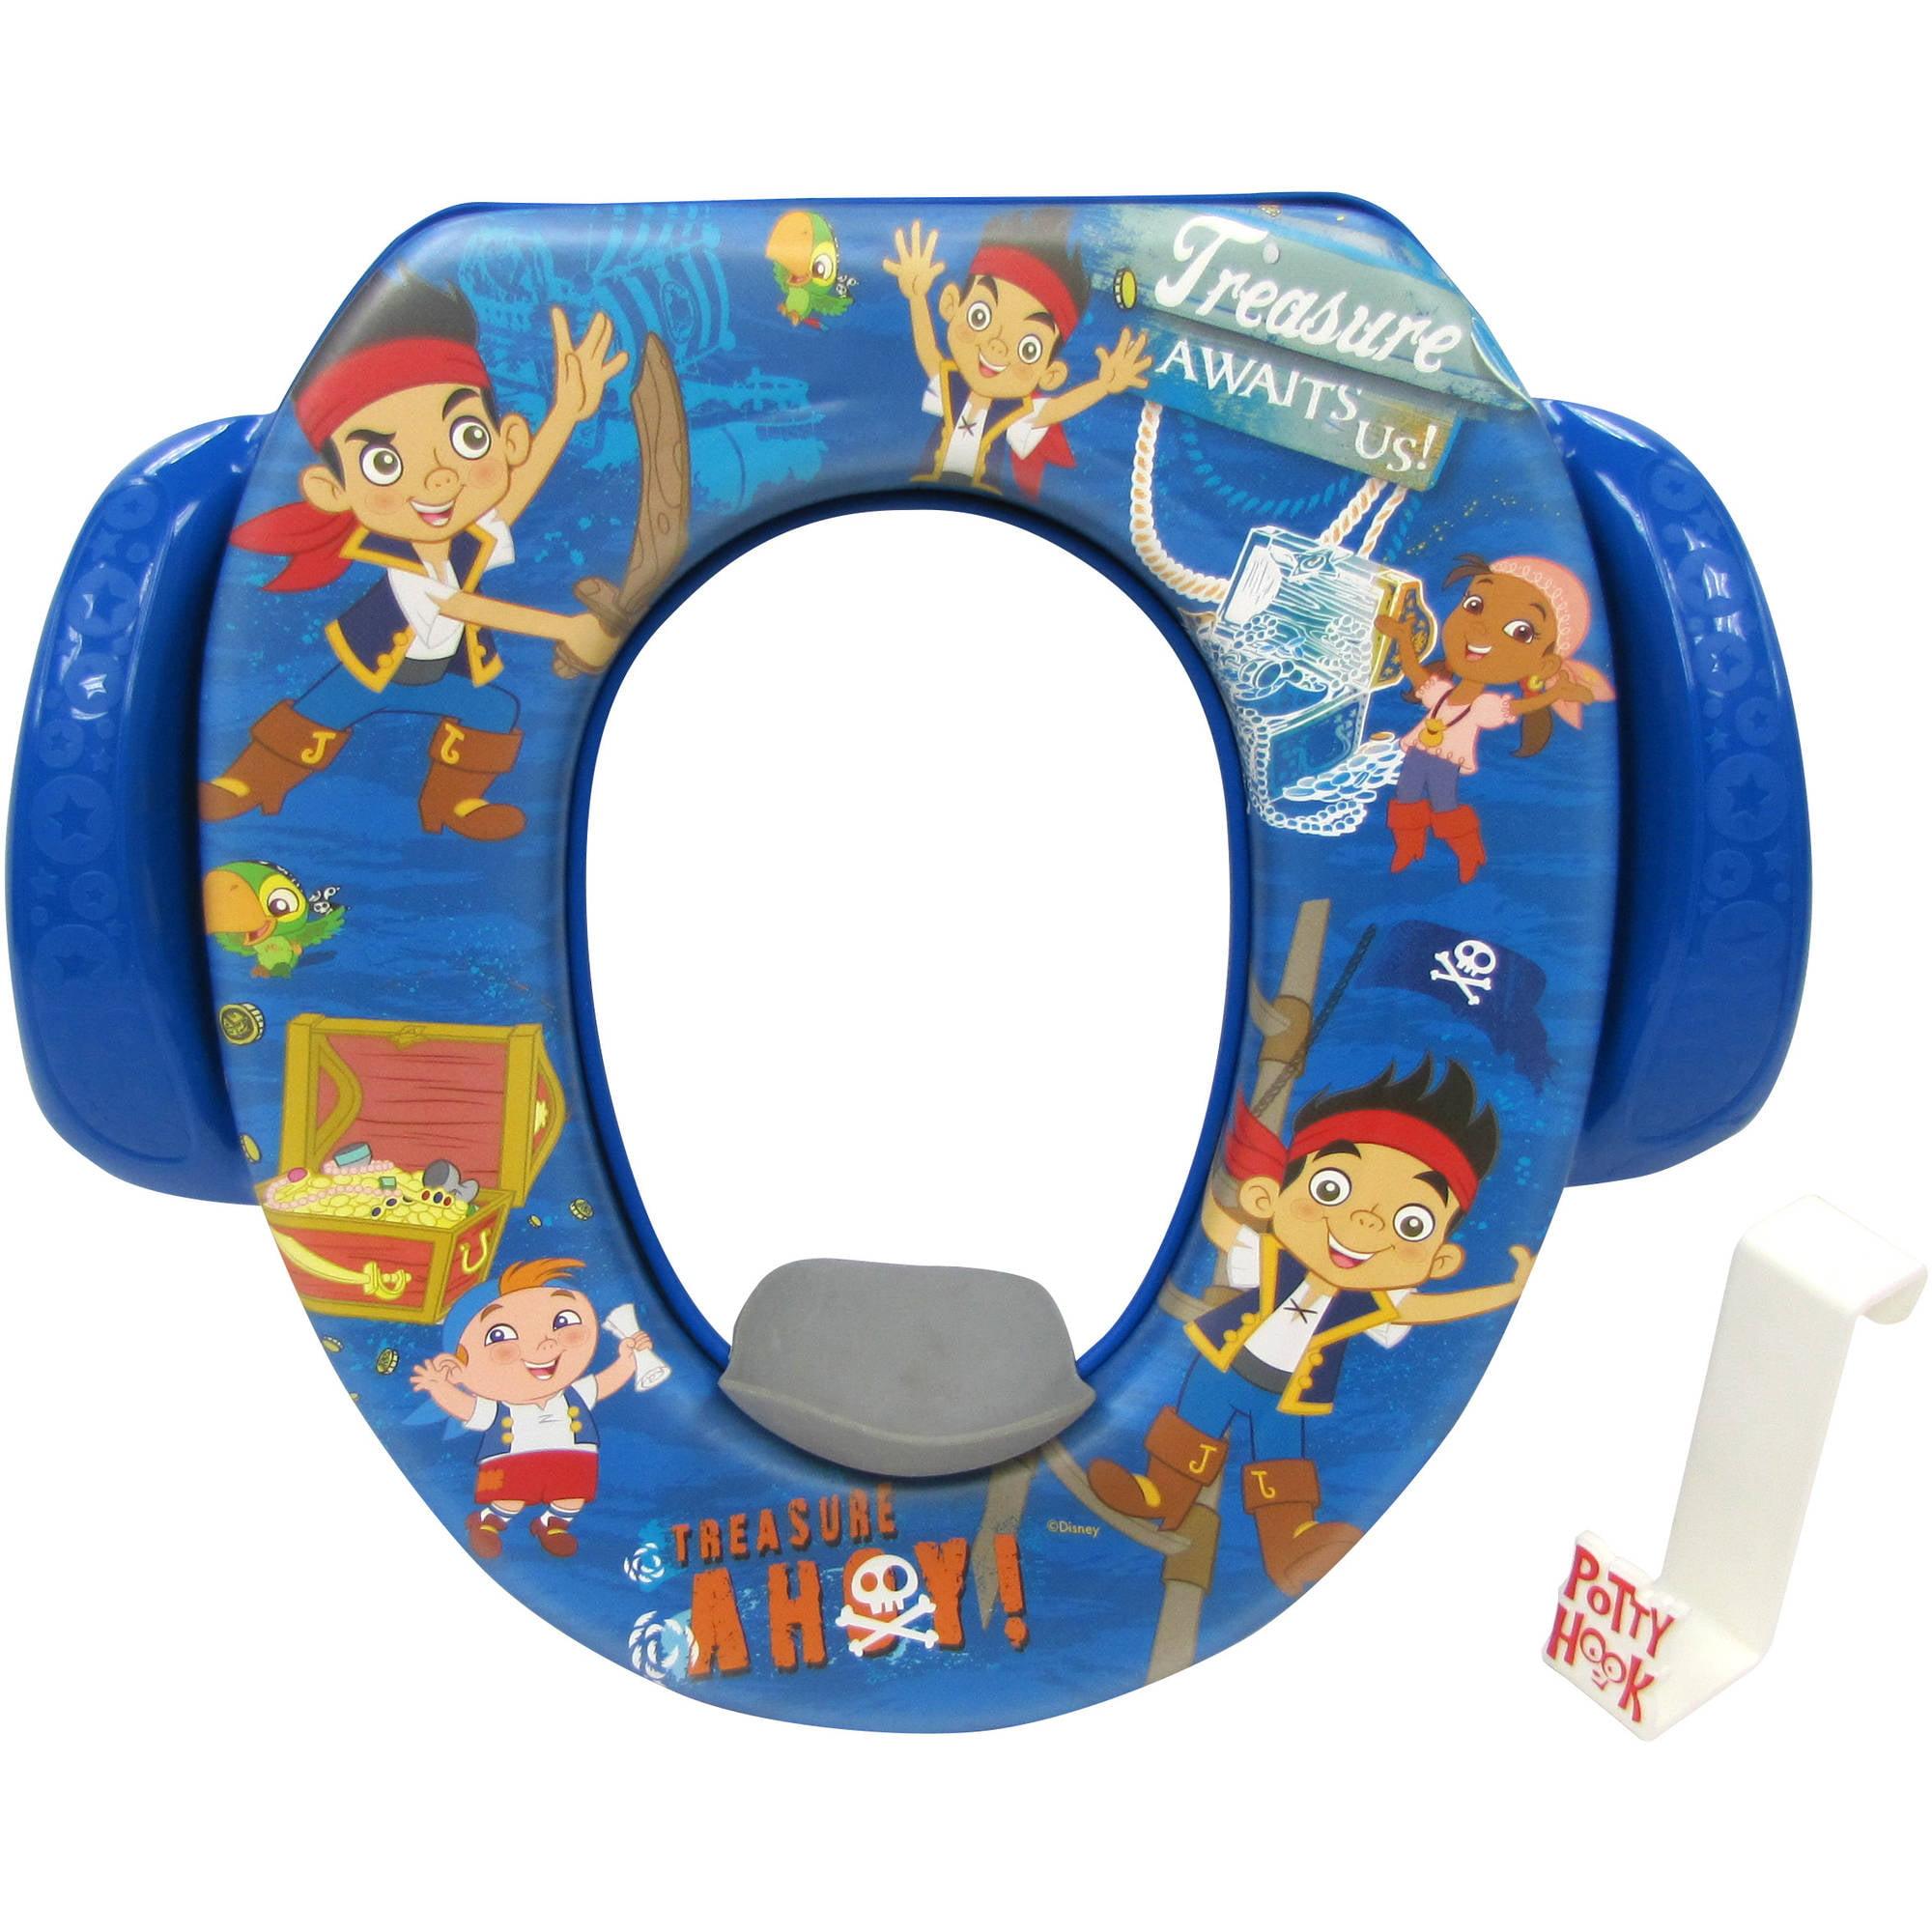 Disney Jake and The Neverland Pirates Soft Potty Seat